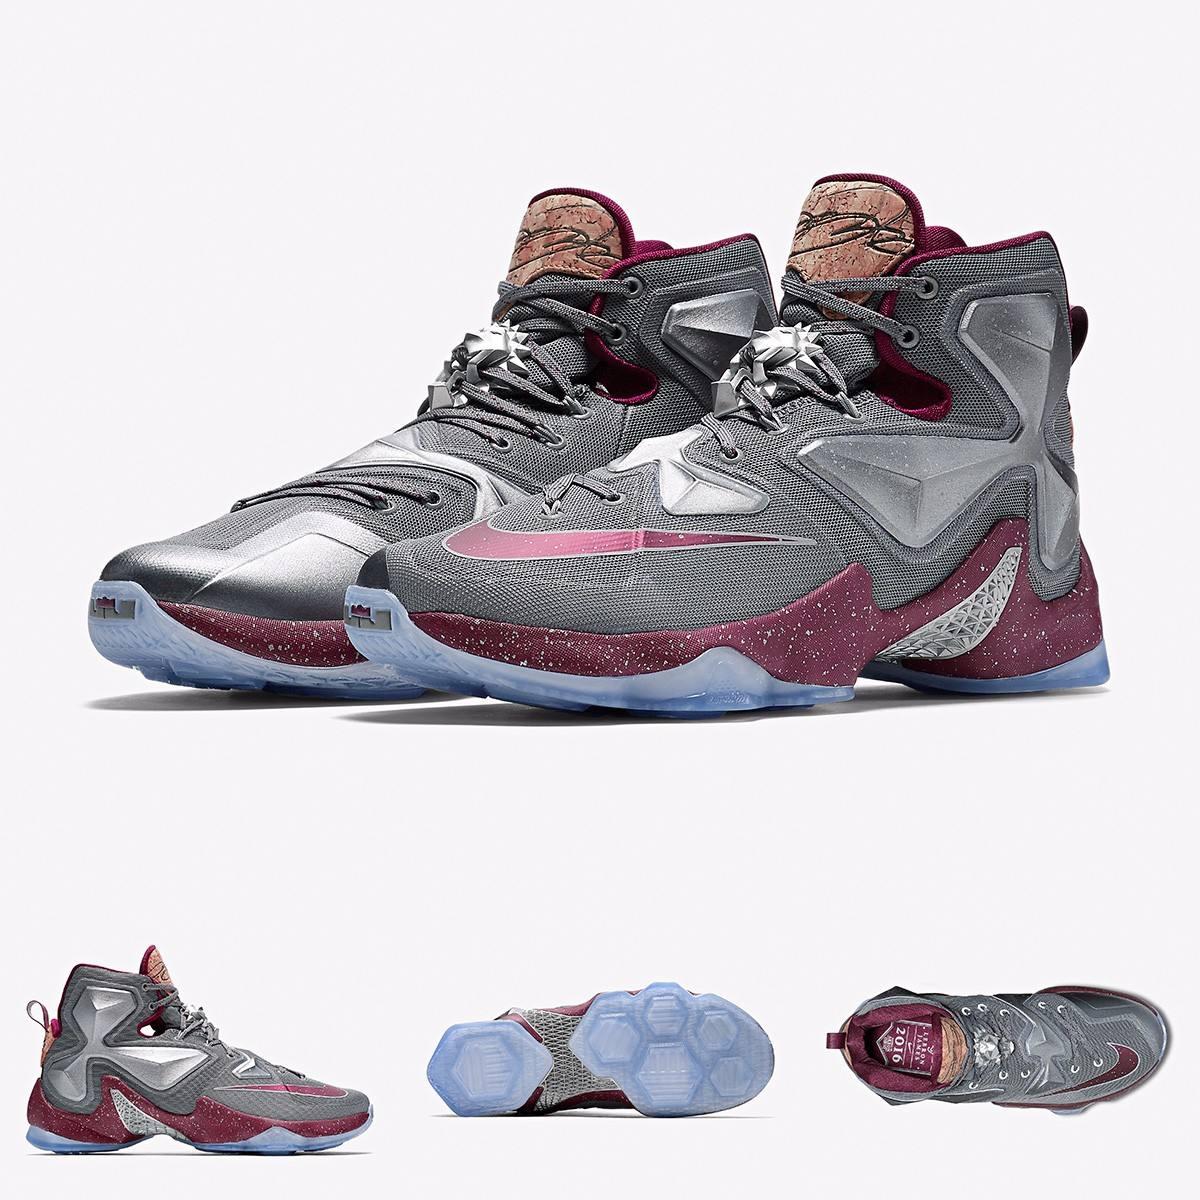 outlet store ef971 99728 Zapatillas Nike Lebron James 13 Wheat Original 2016